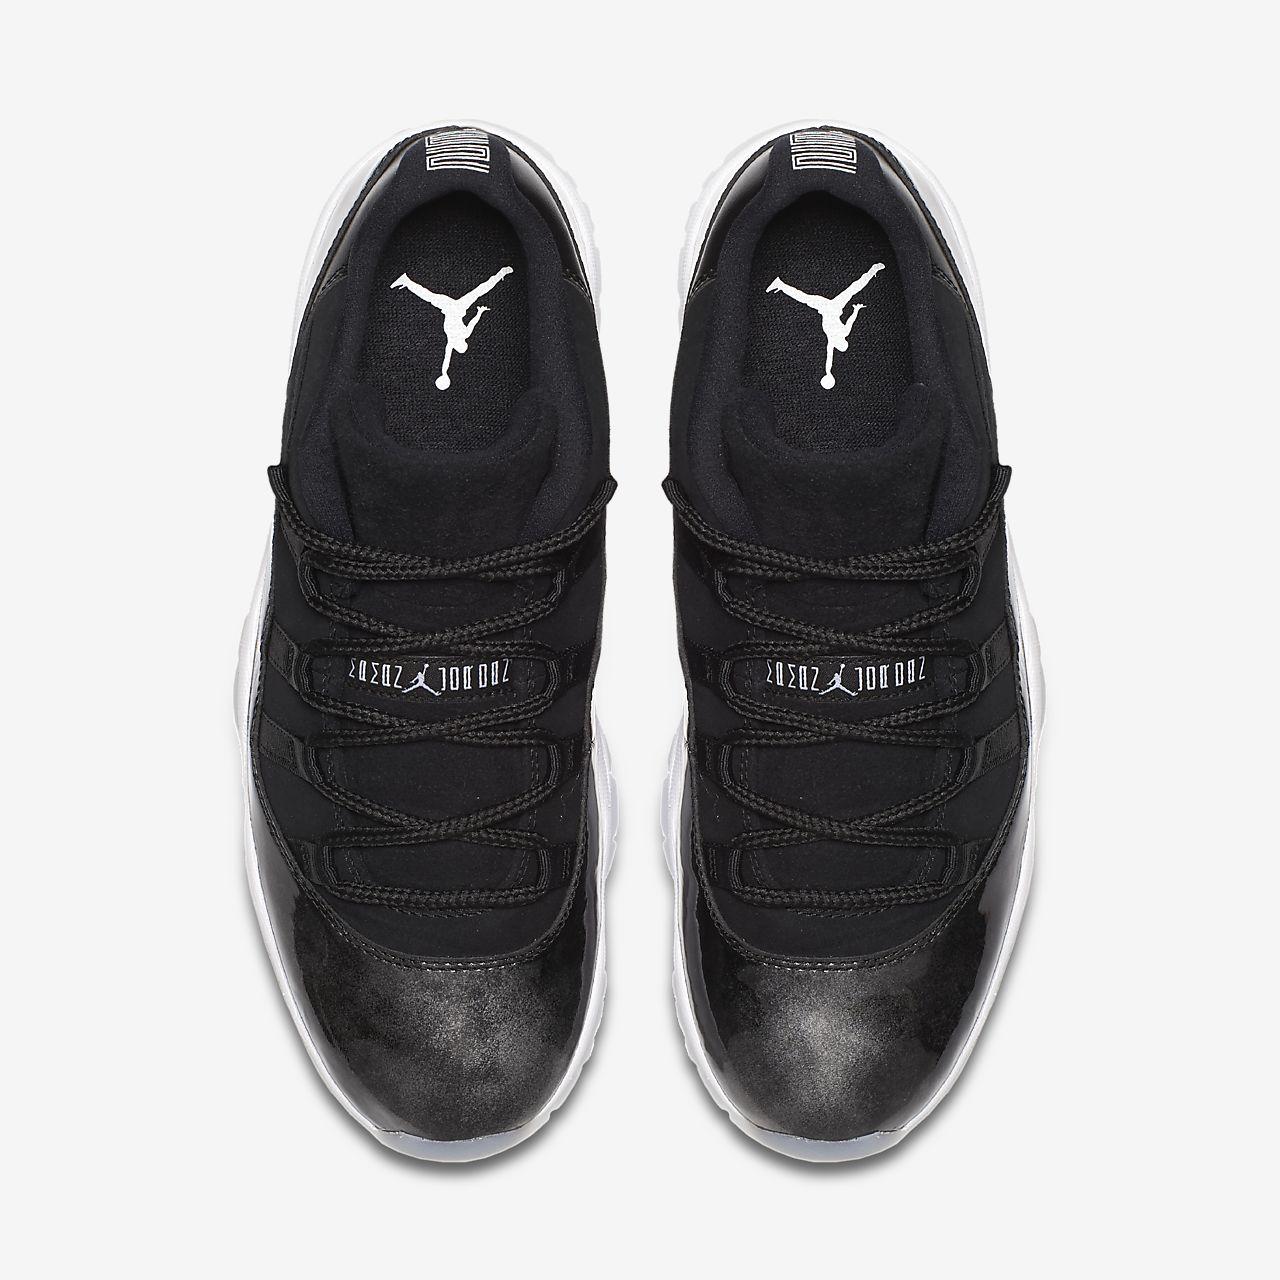 various colors 6225d 1f8d1 ... Air Jordan 11 Retro Low Men s Shoe